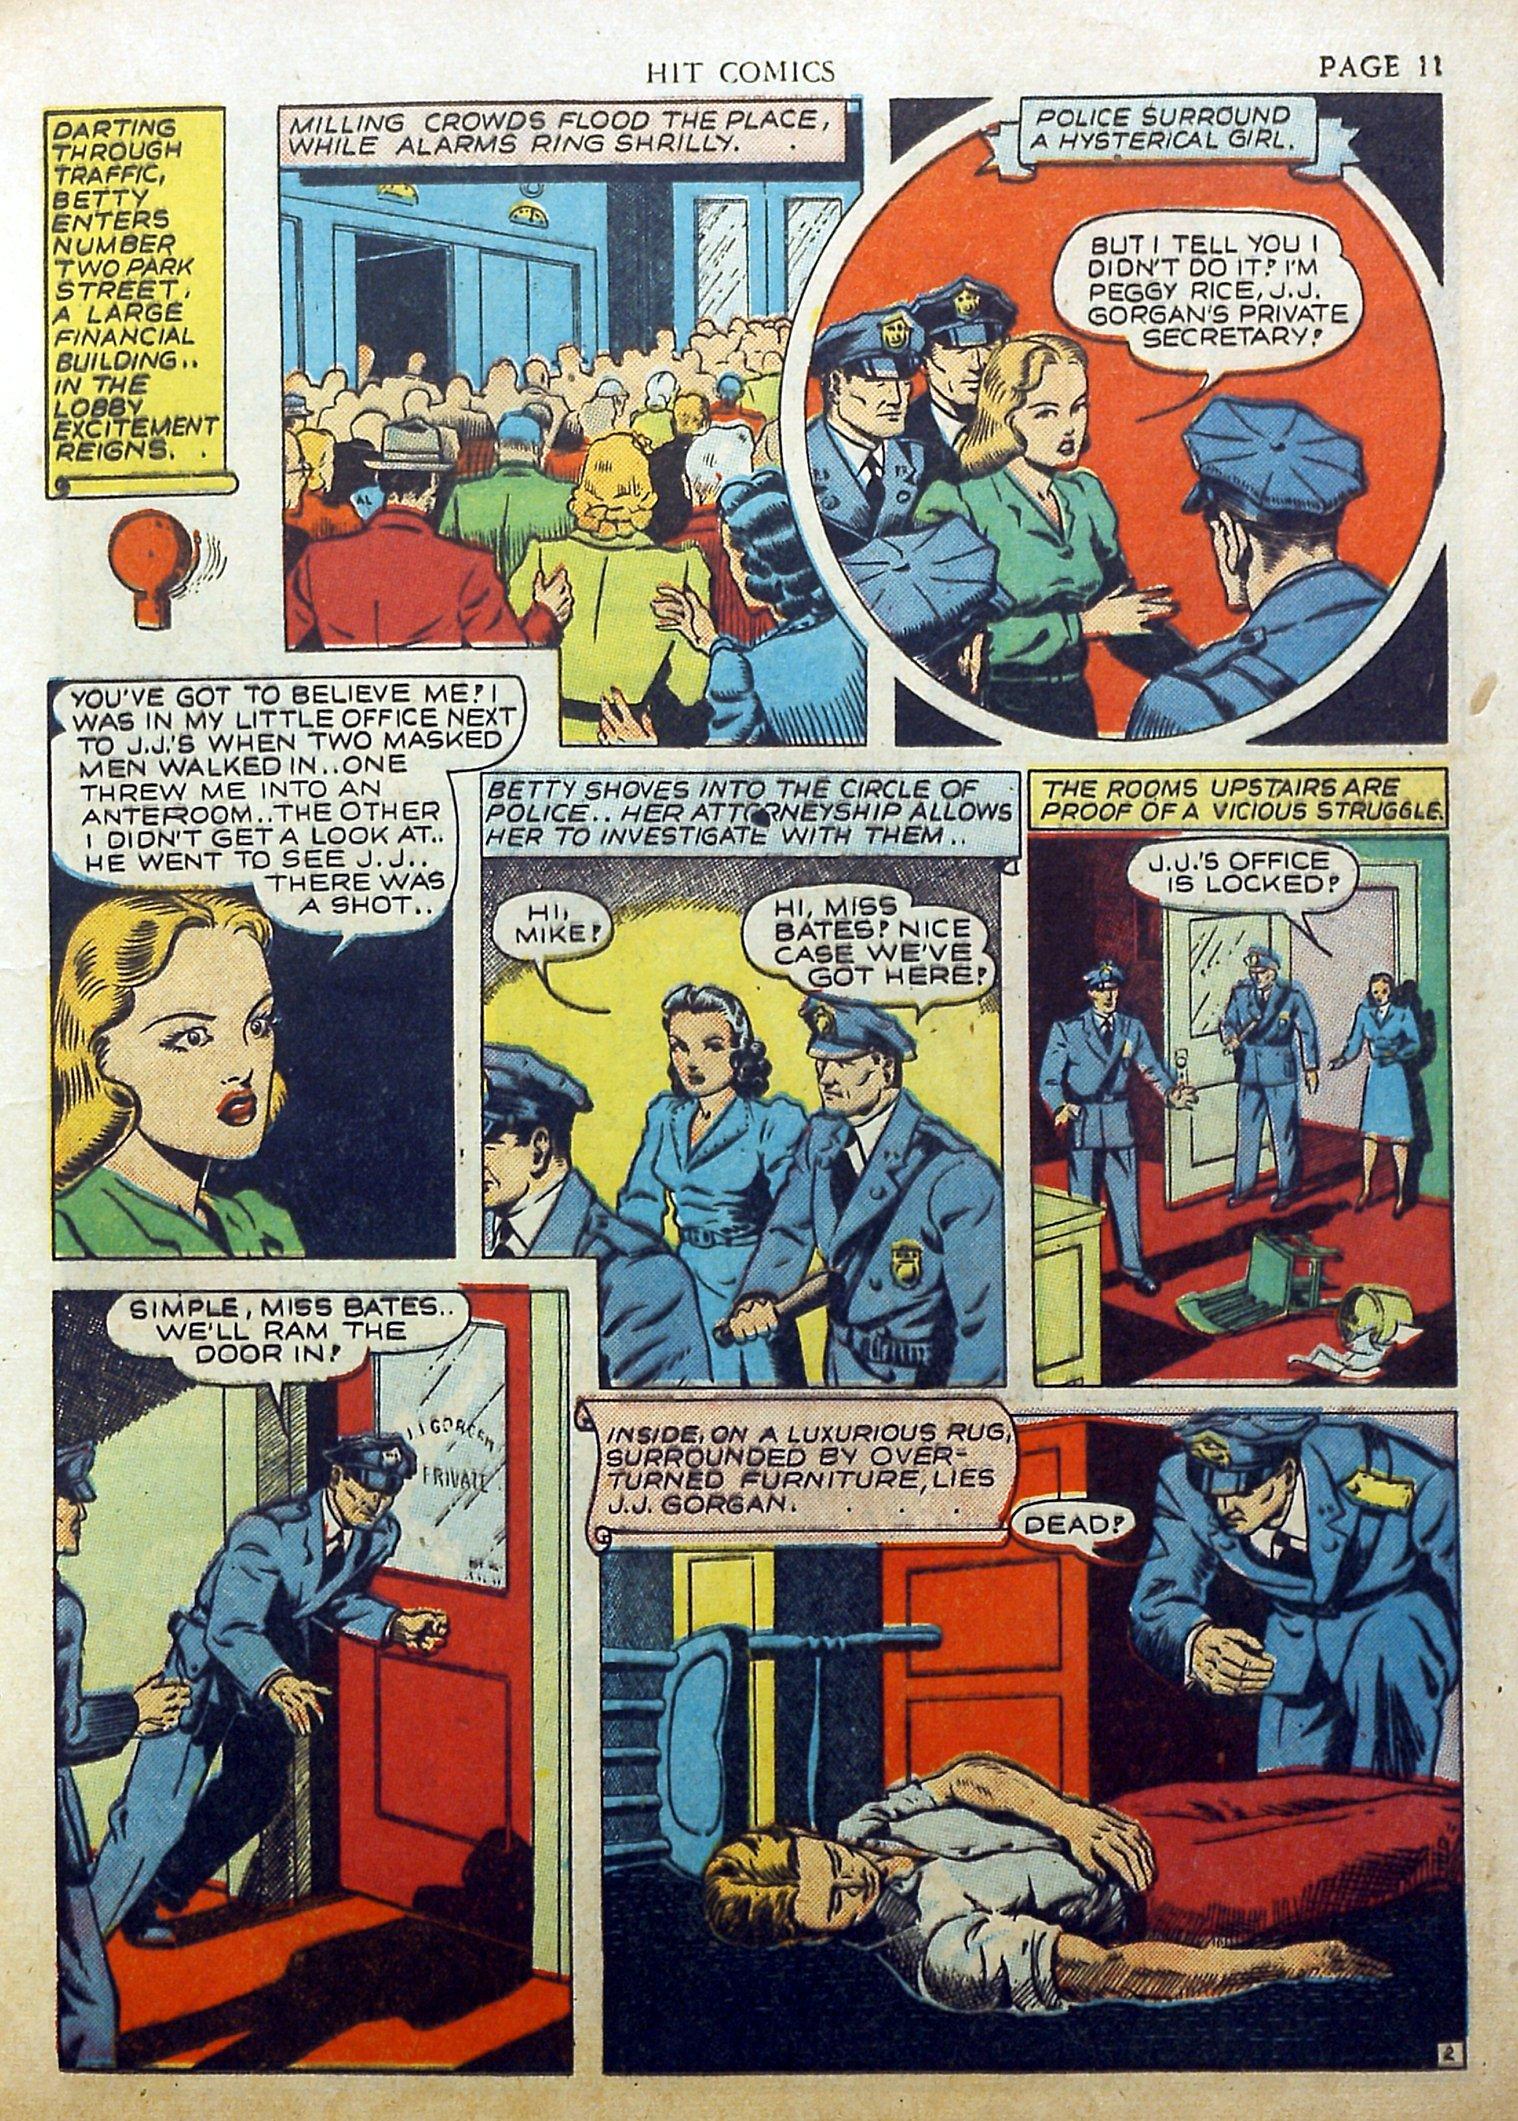 Read online Hit Comics comic -  Issue #17 - 13